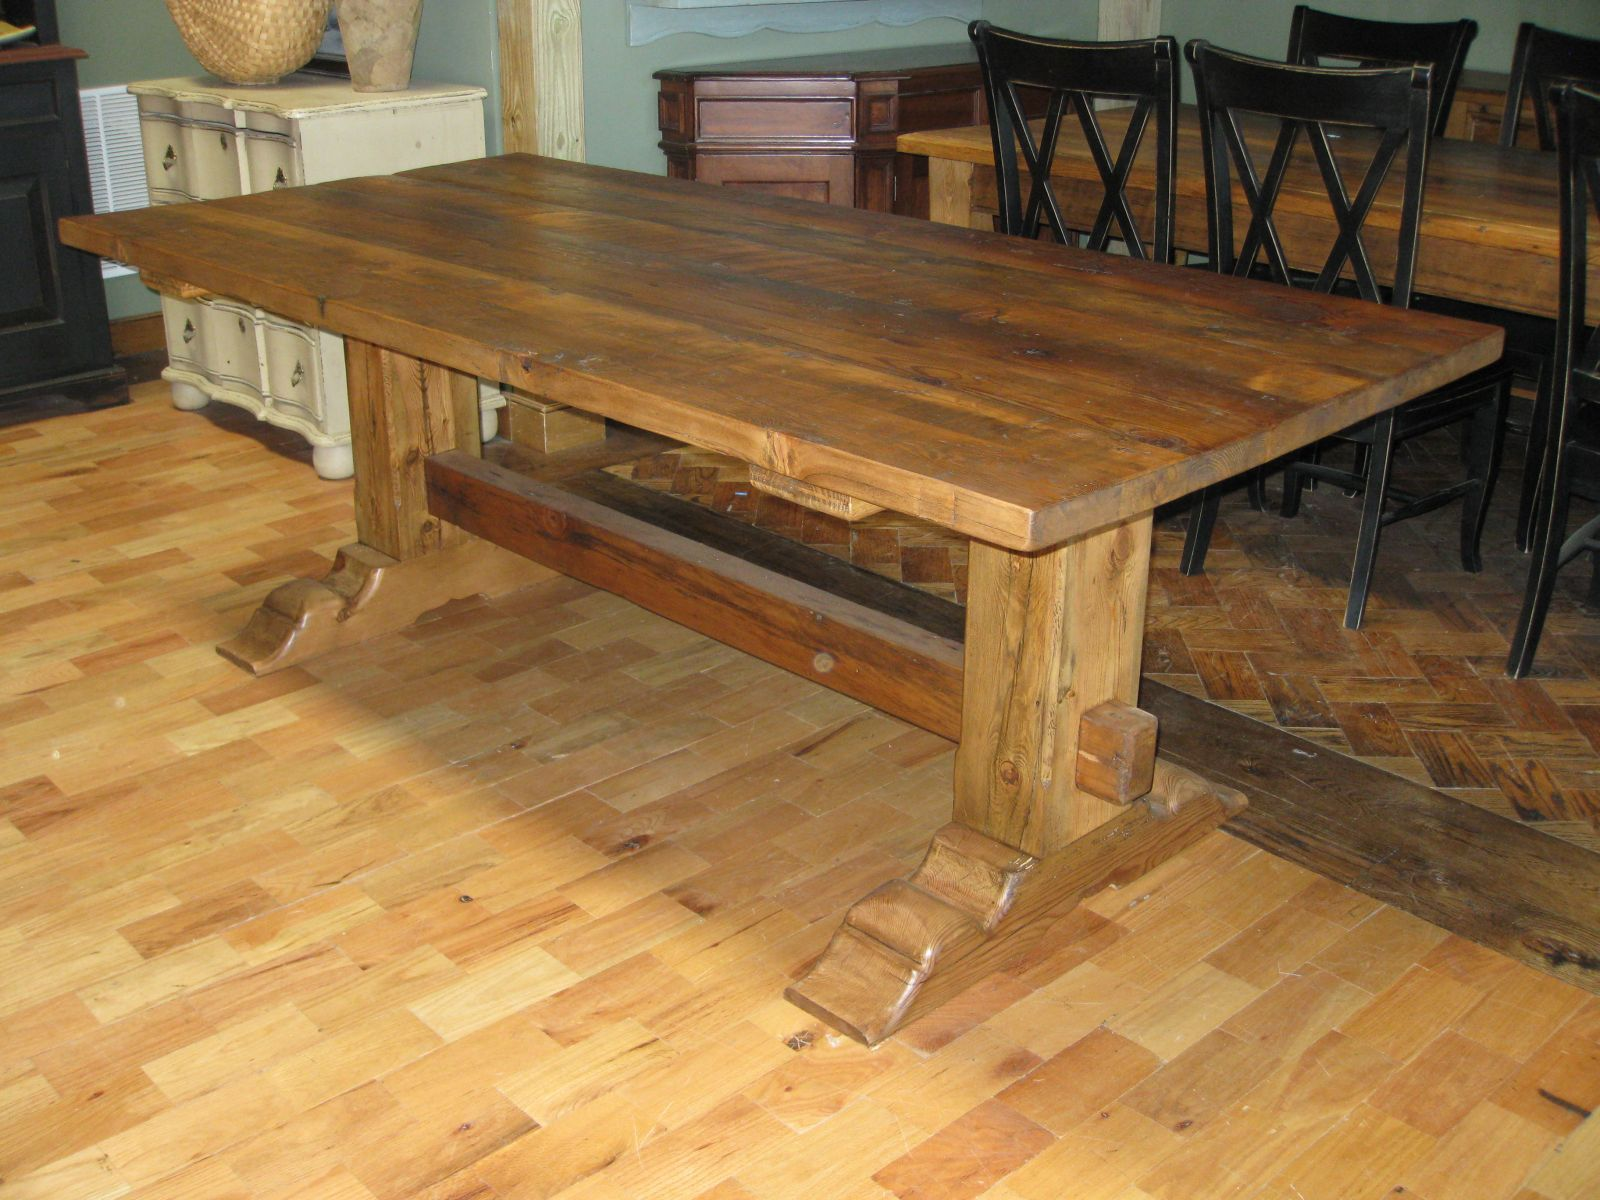 Beautiful Old Wood Beam Trestle Table